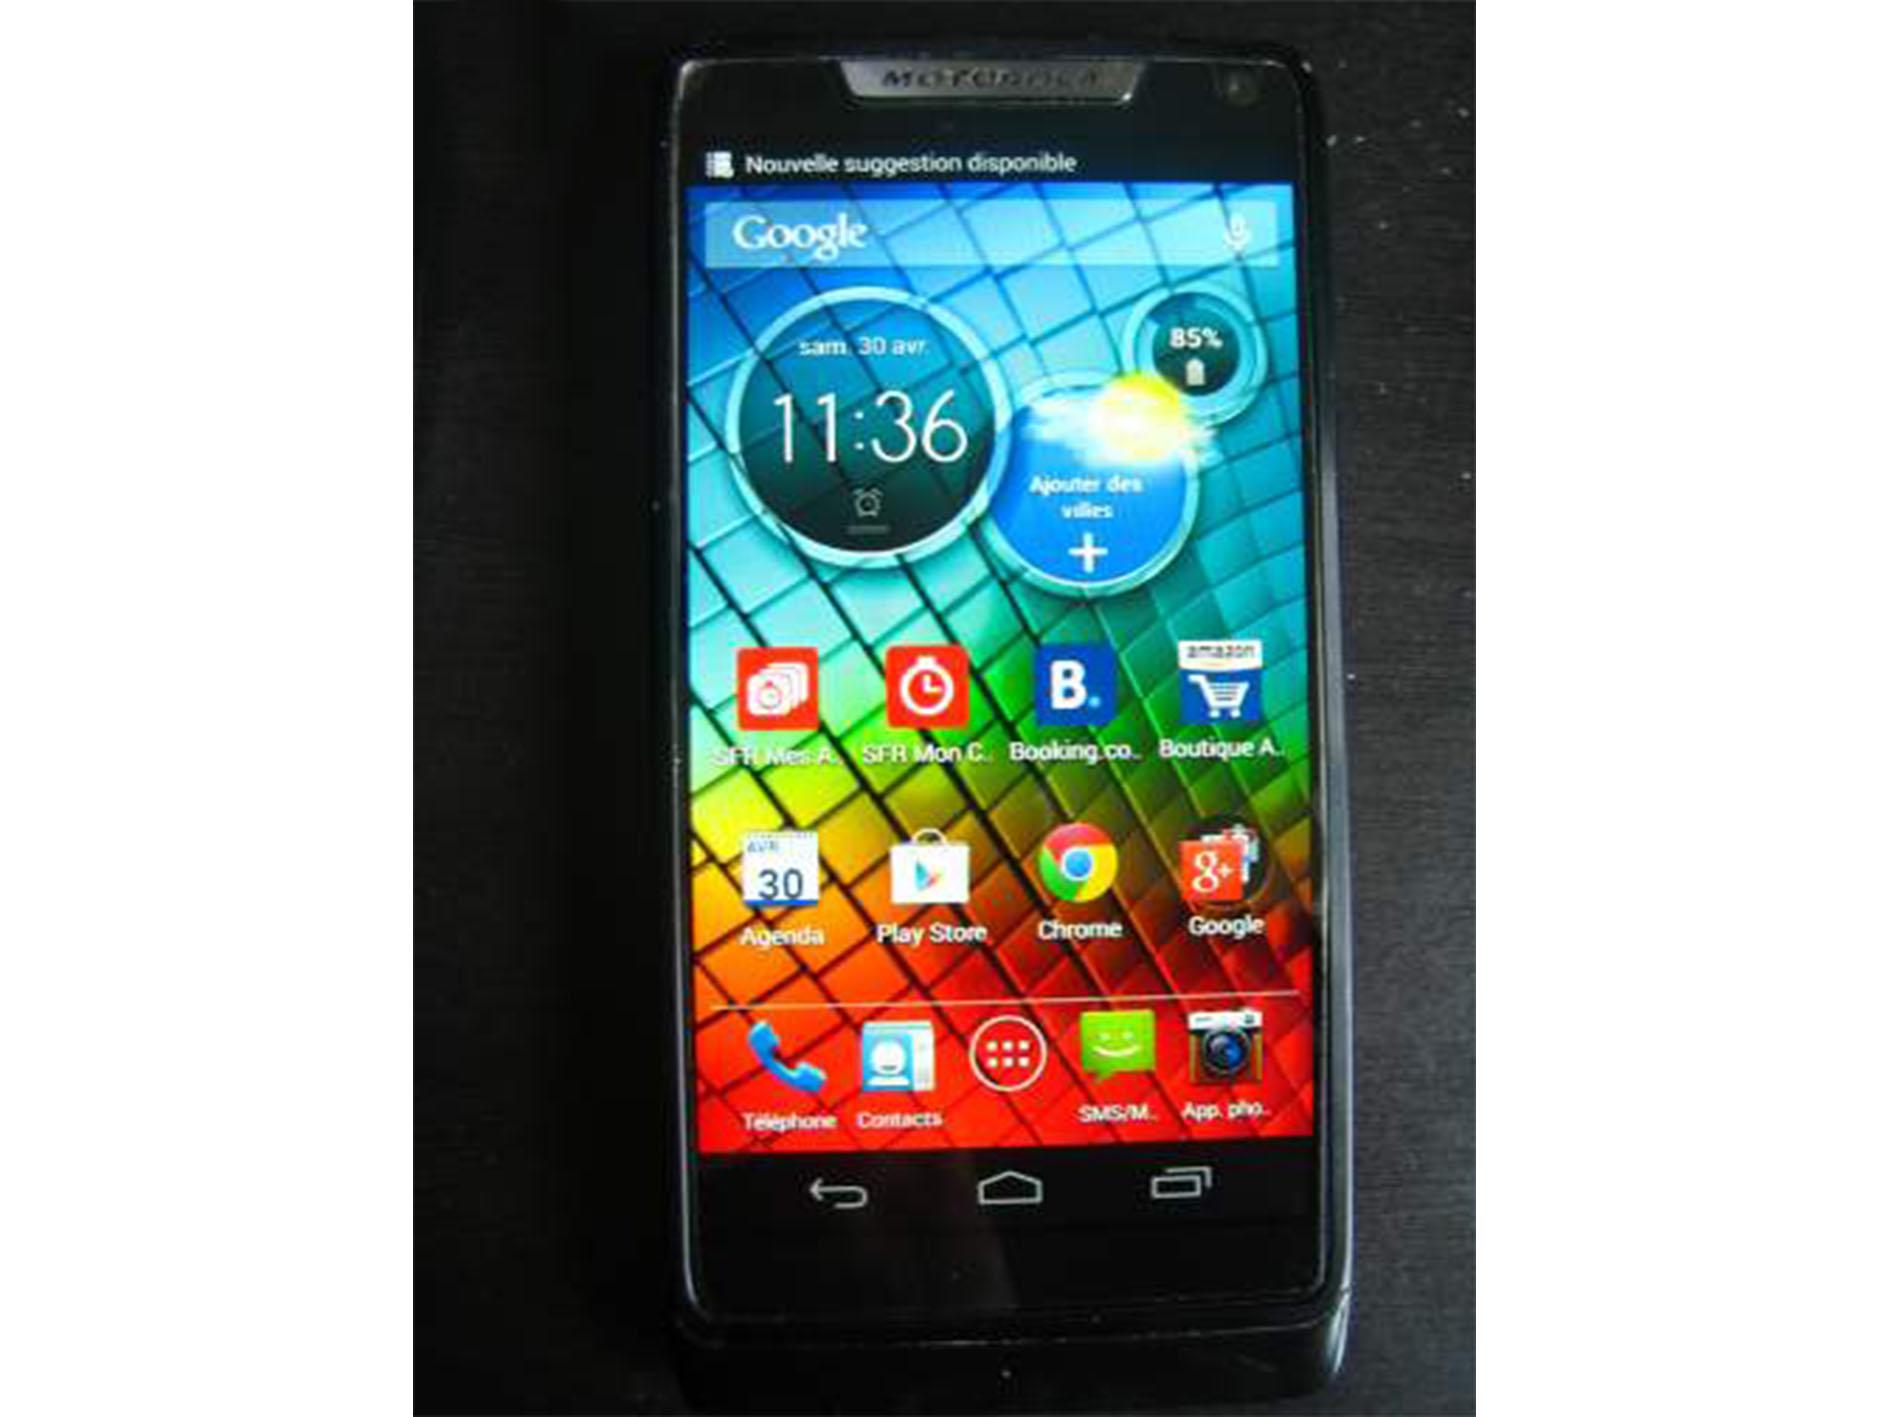 Le smartphone Motorola